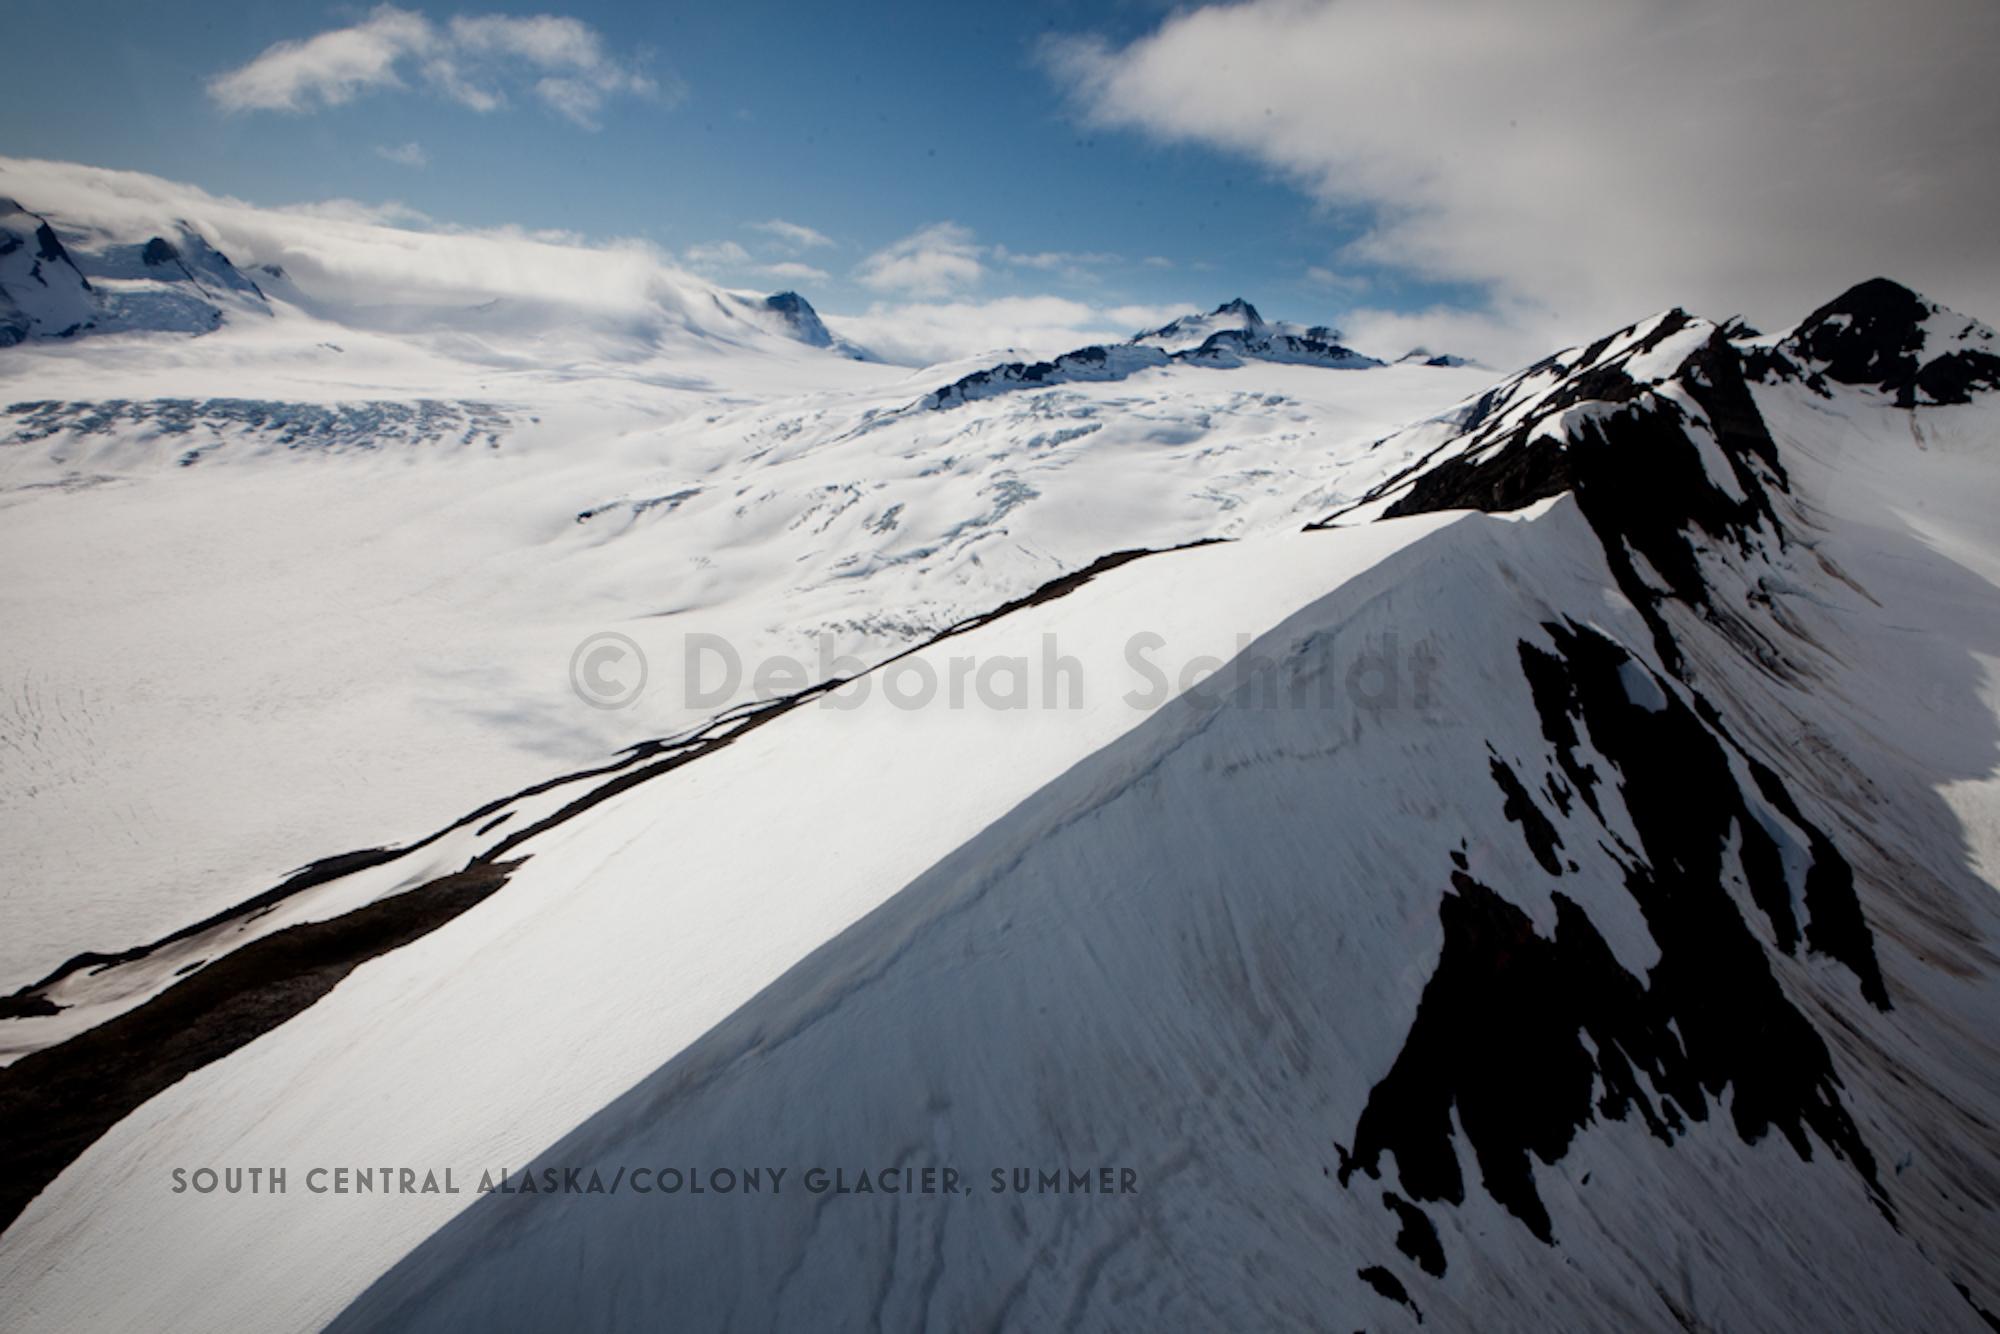 CT6.South Central Alaska-Colony Glacier_ summer.jpg